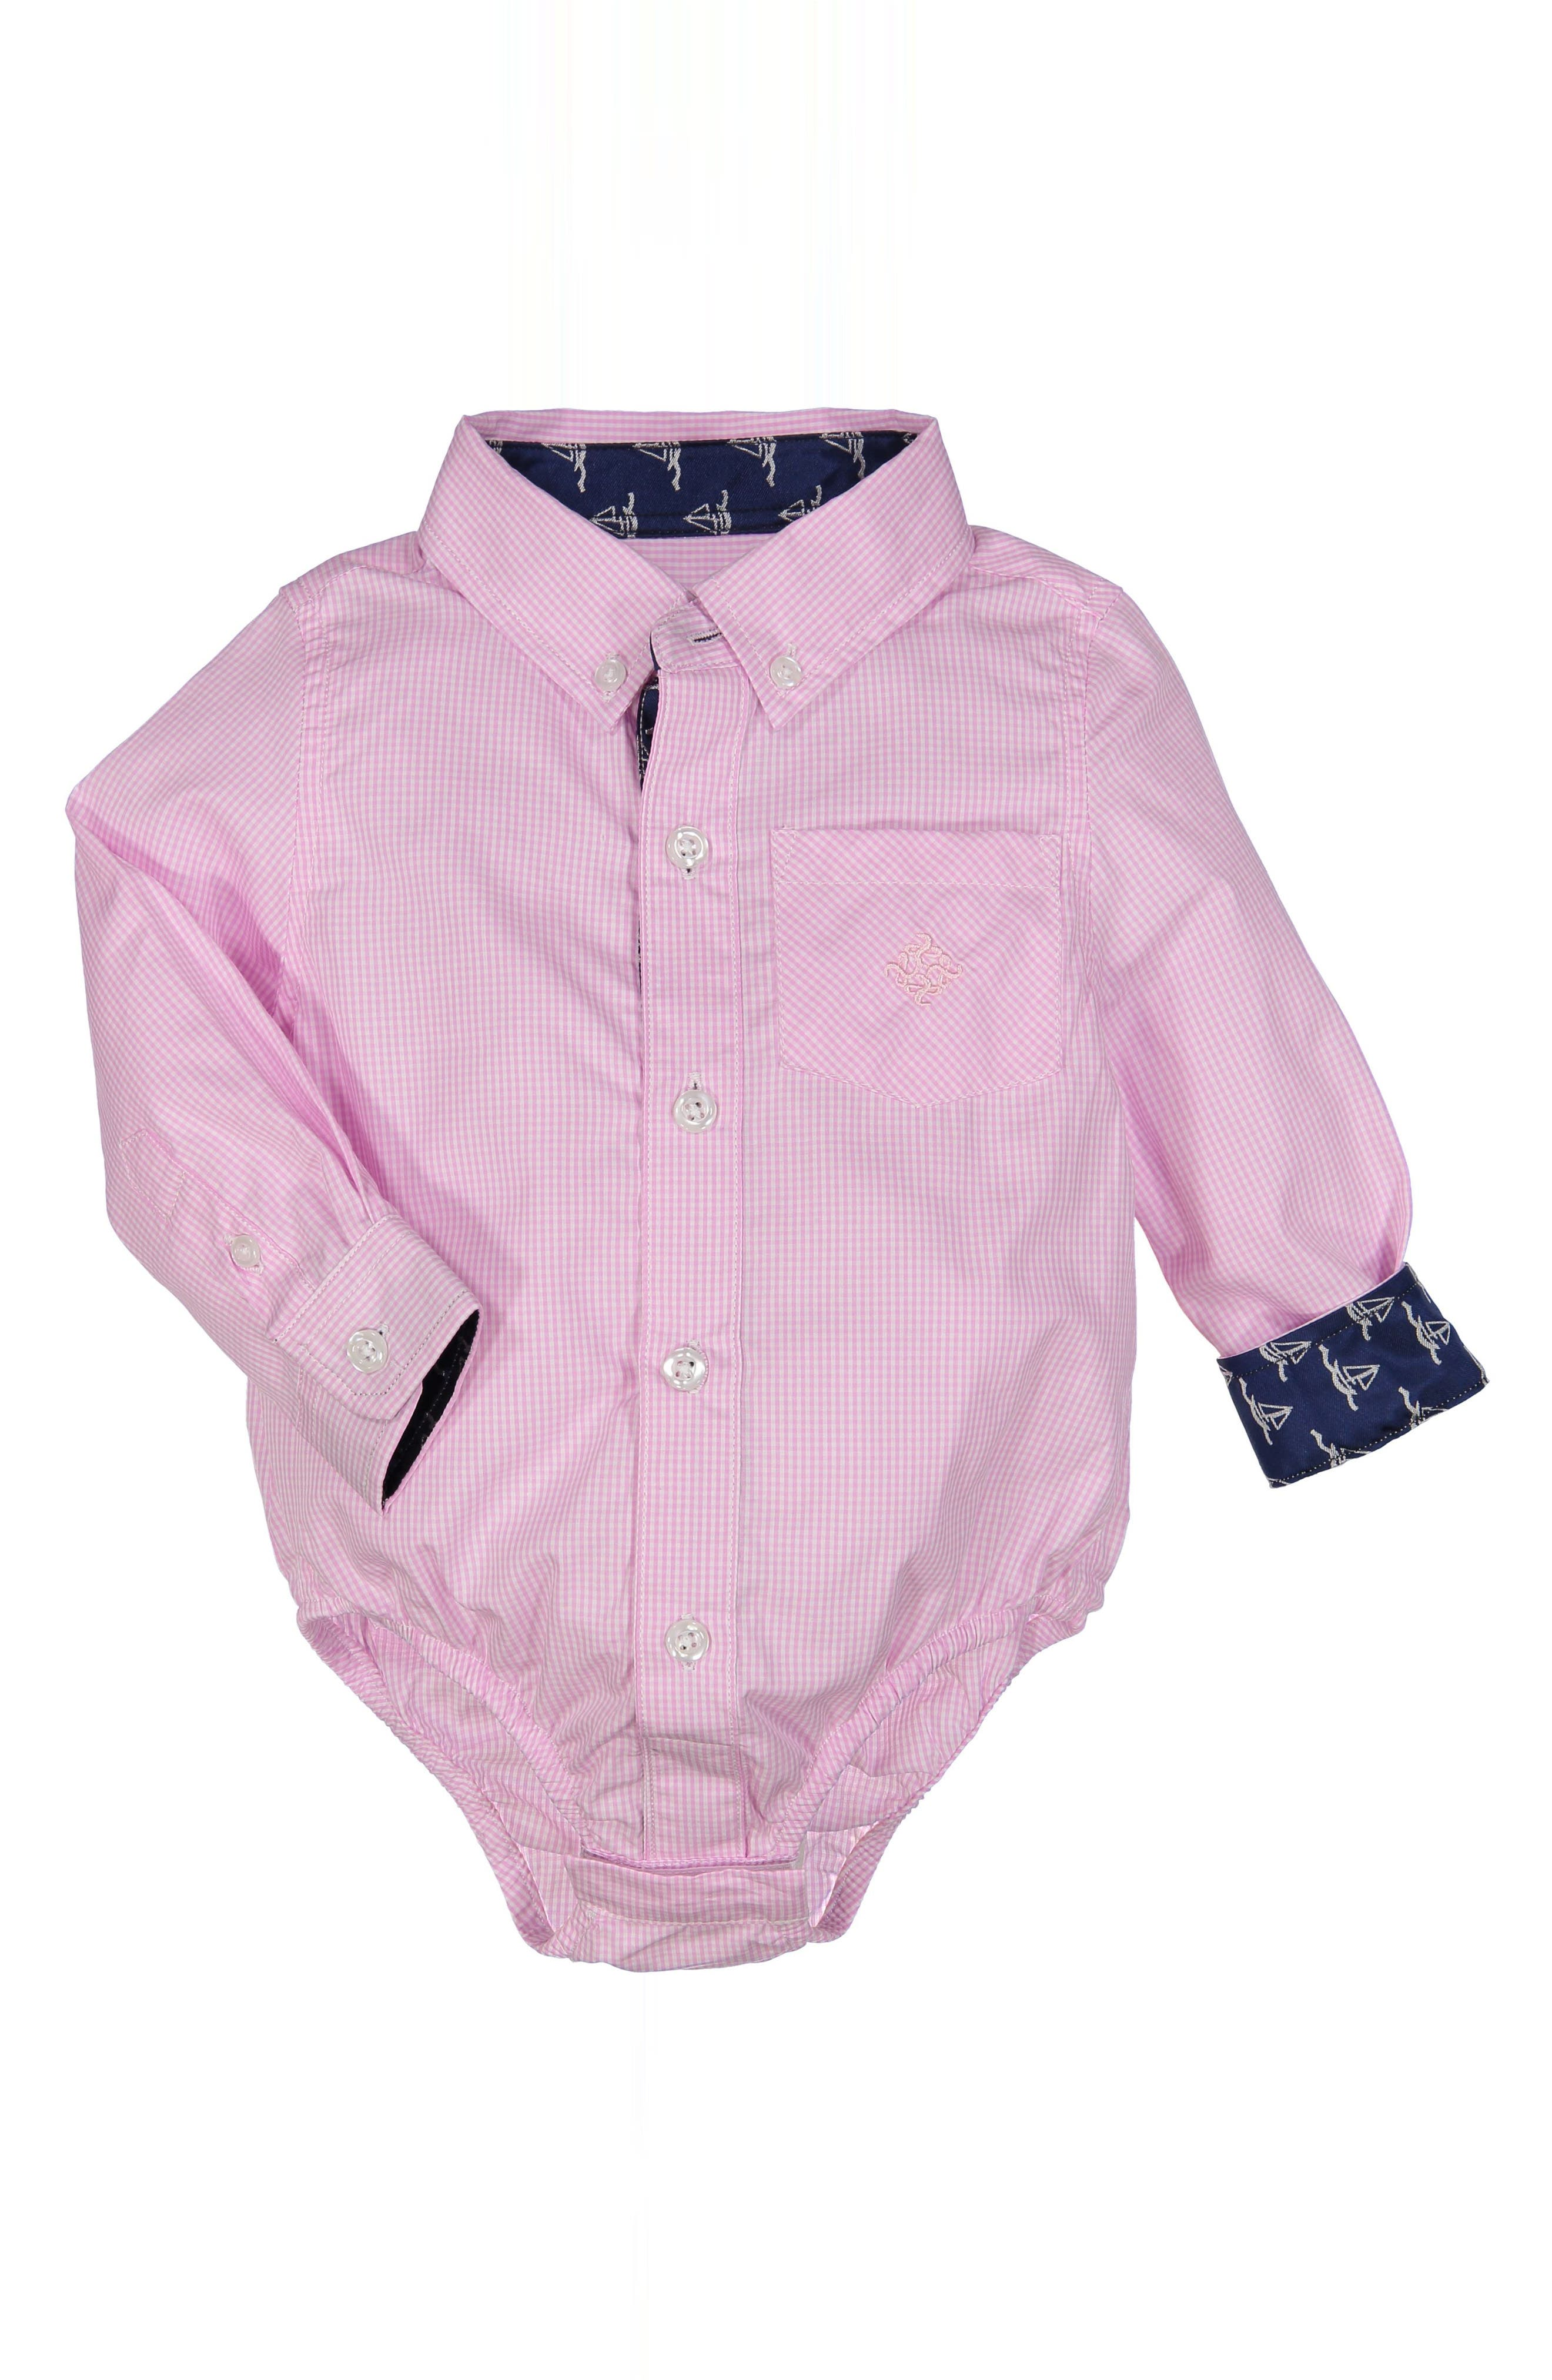 Shirtzie Microcheck Bodysuit,                             Main thumbnail 1, color,                             Pink